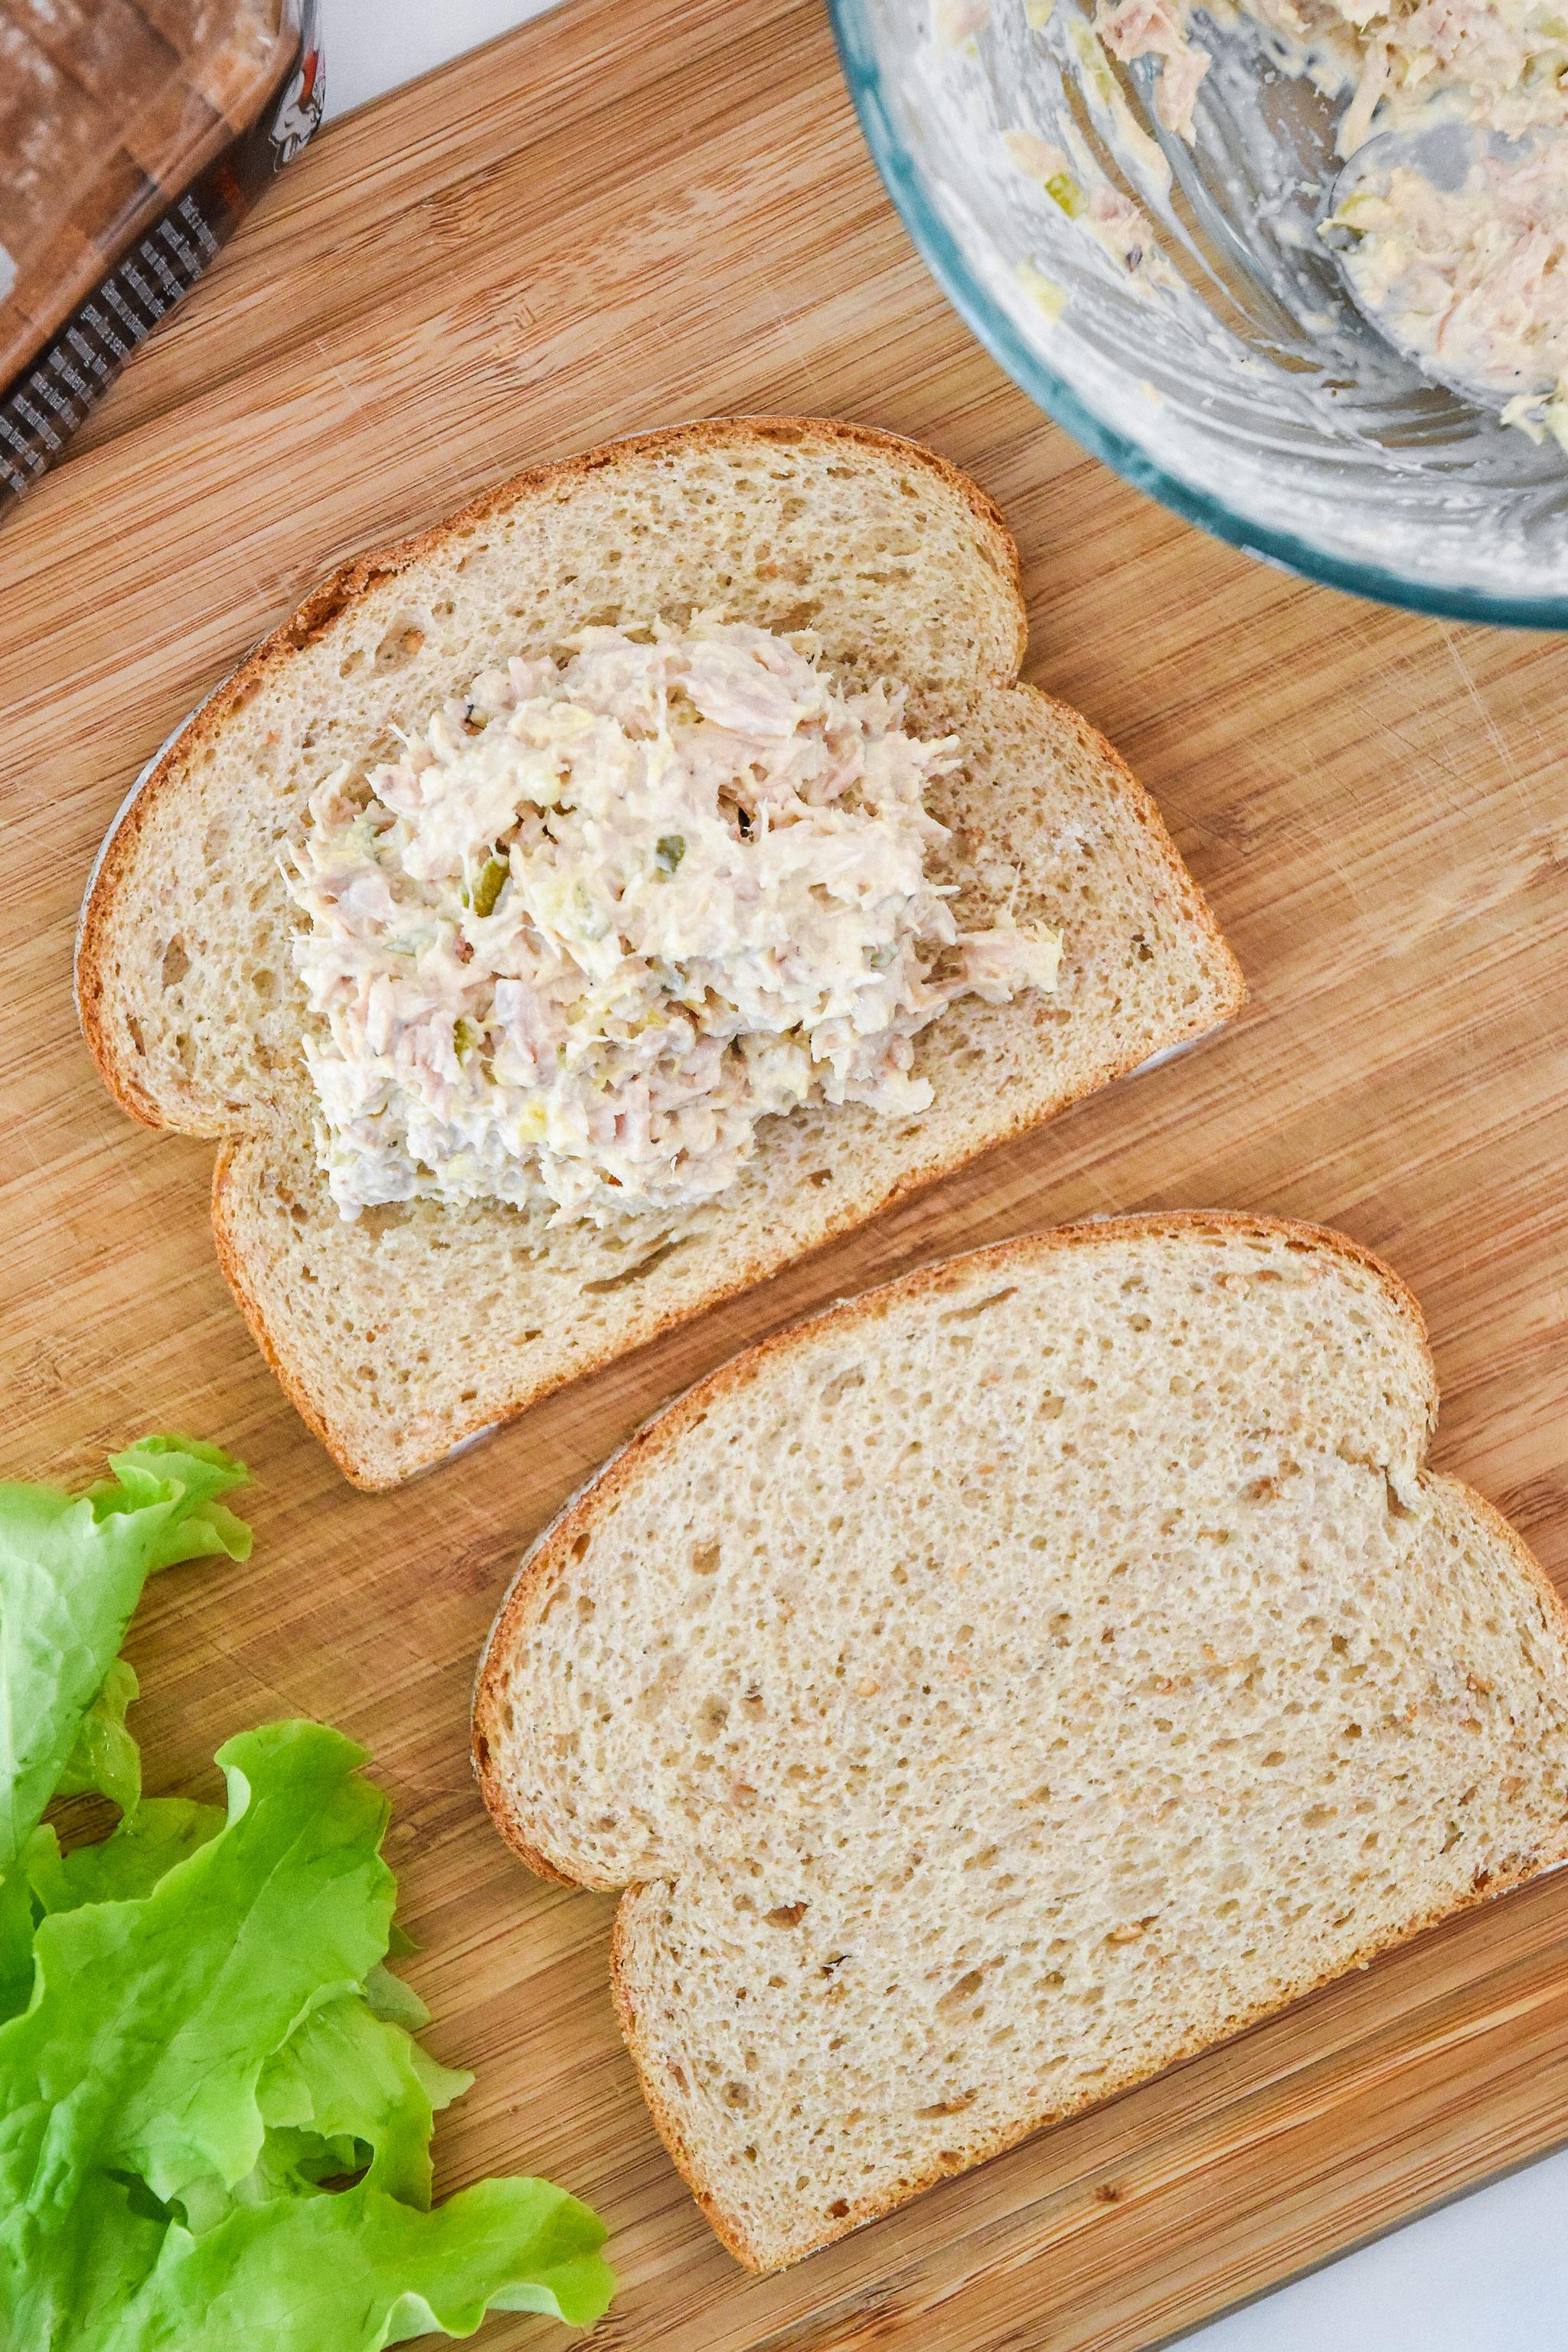 assembling a tuna sandwich with the no chop tuna salad.